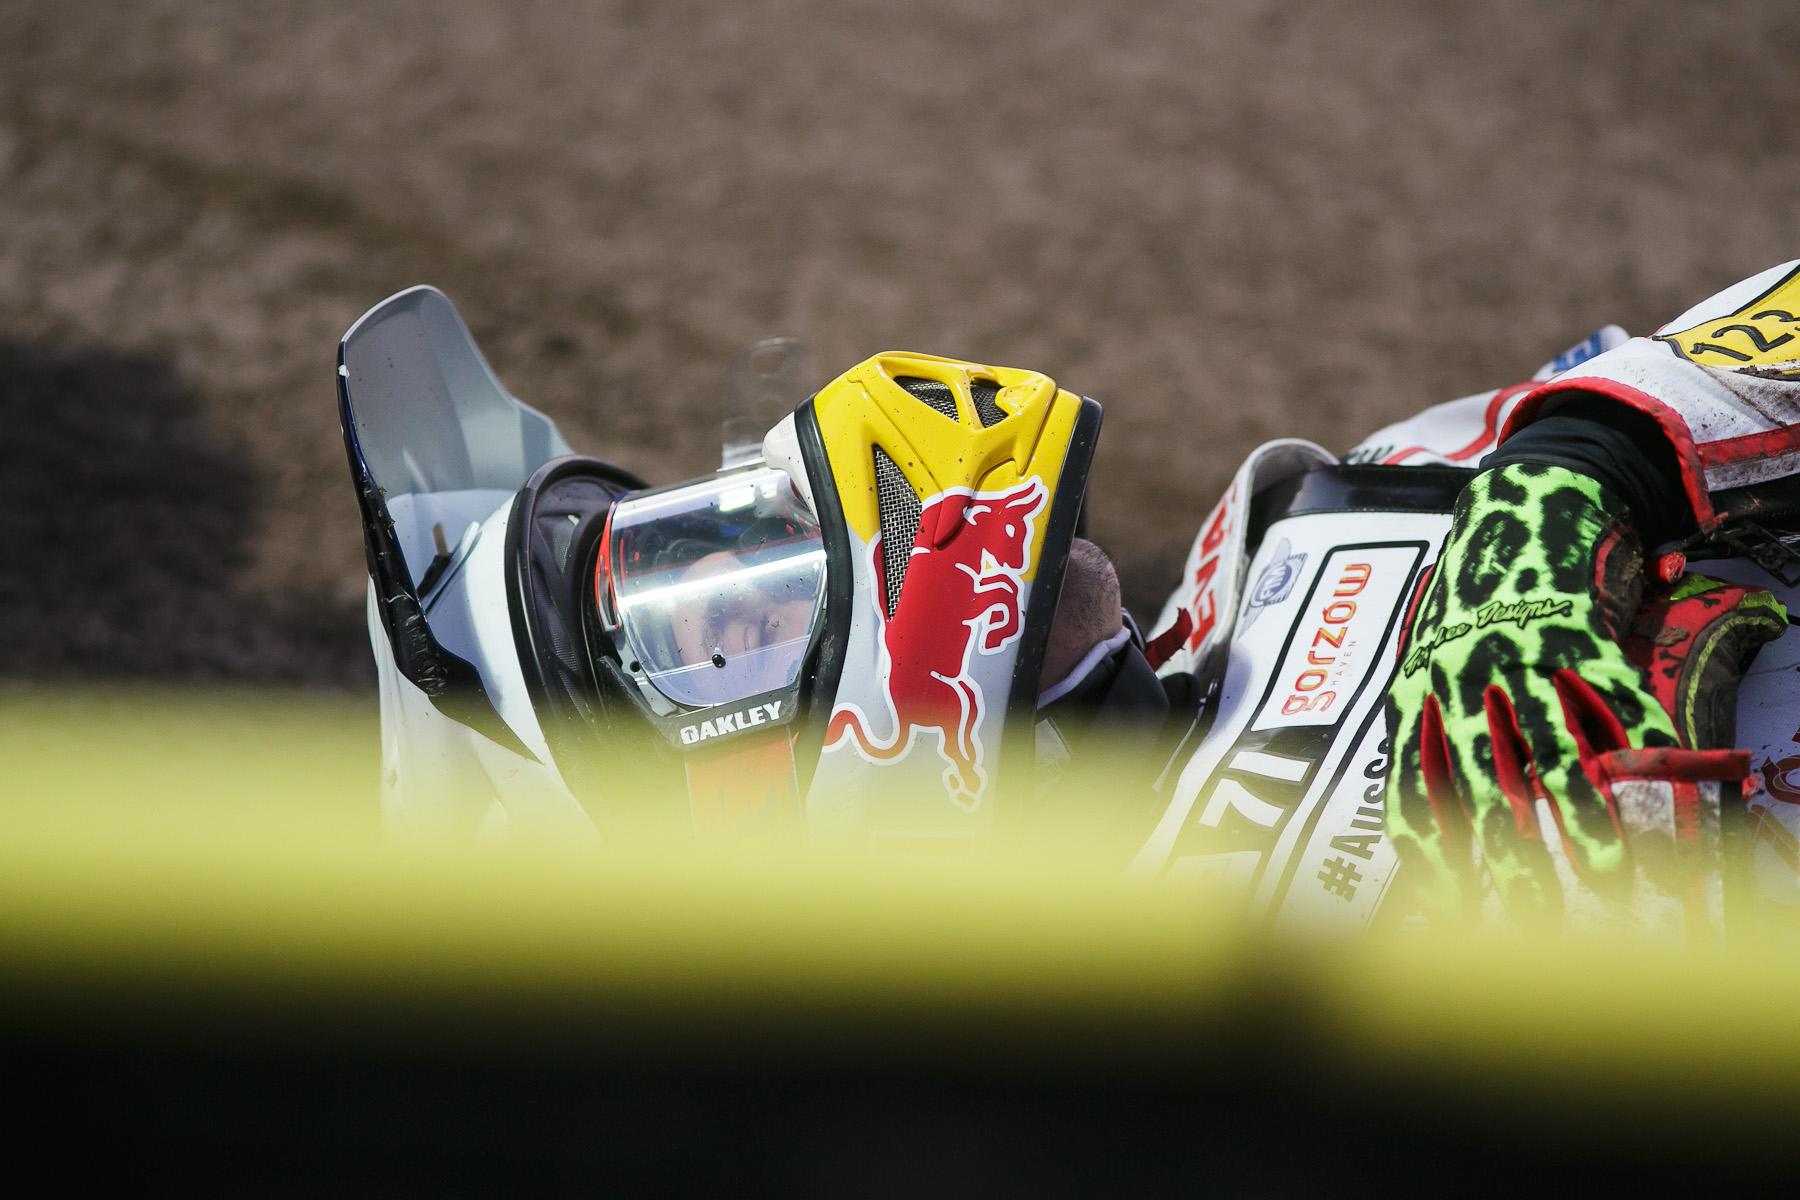 Maciej Janowski of Poland lies on the ground after crashing during the Mitas Slovenian FIM Speedway Grand Prix at Matija Gubec Stadium in Krsko, Slovenia, Sep. 12, 2015.